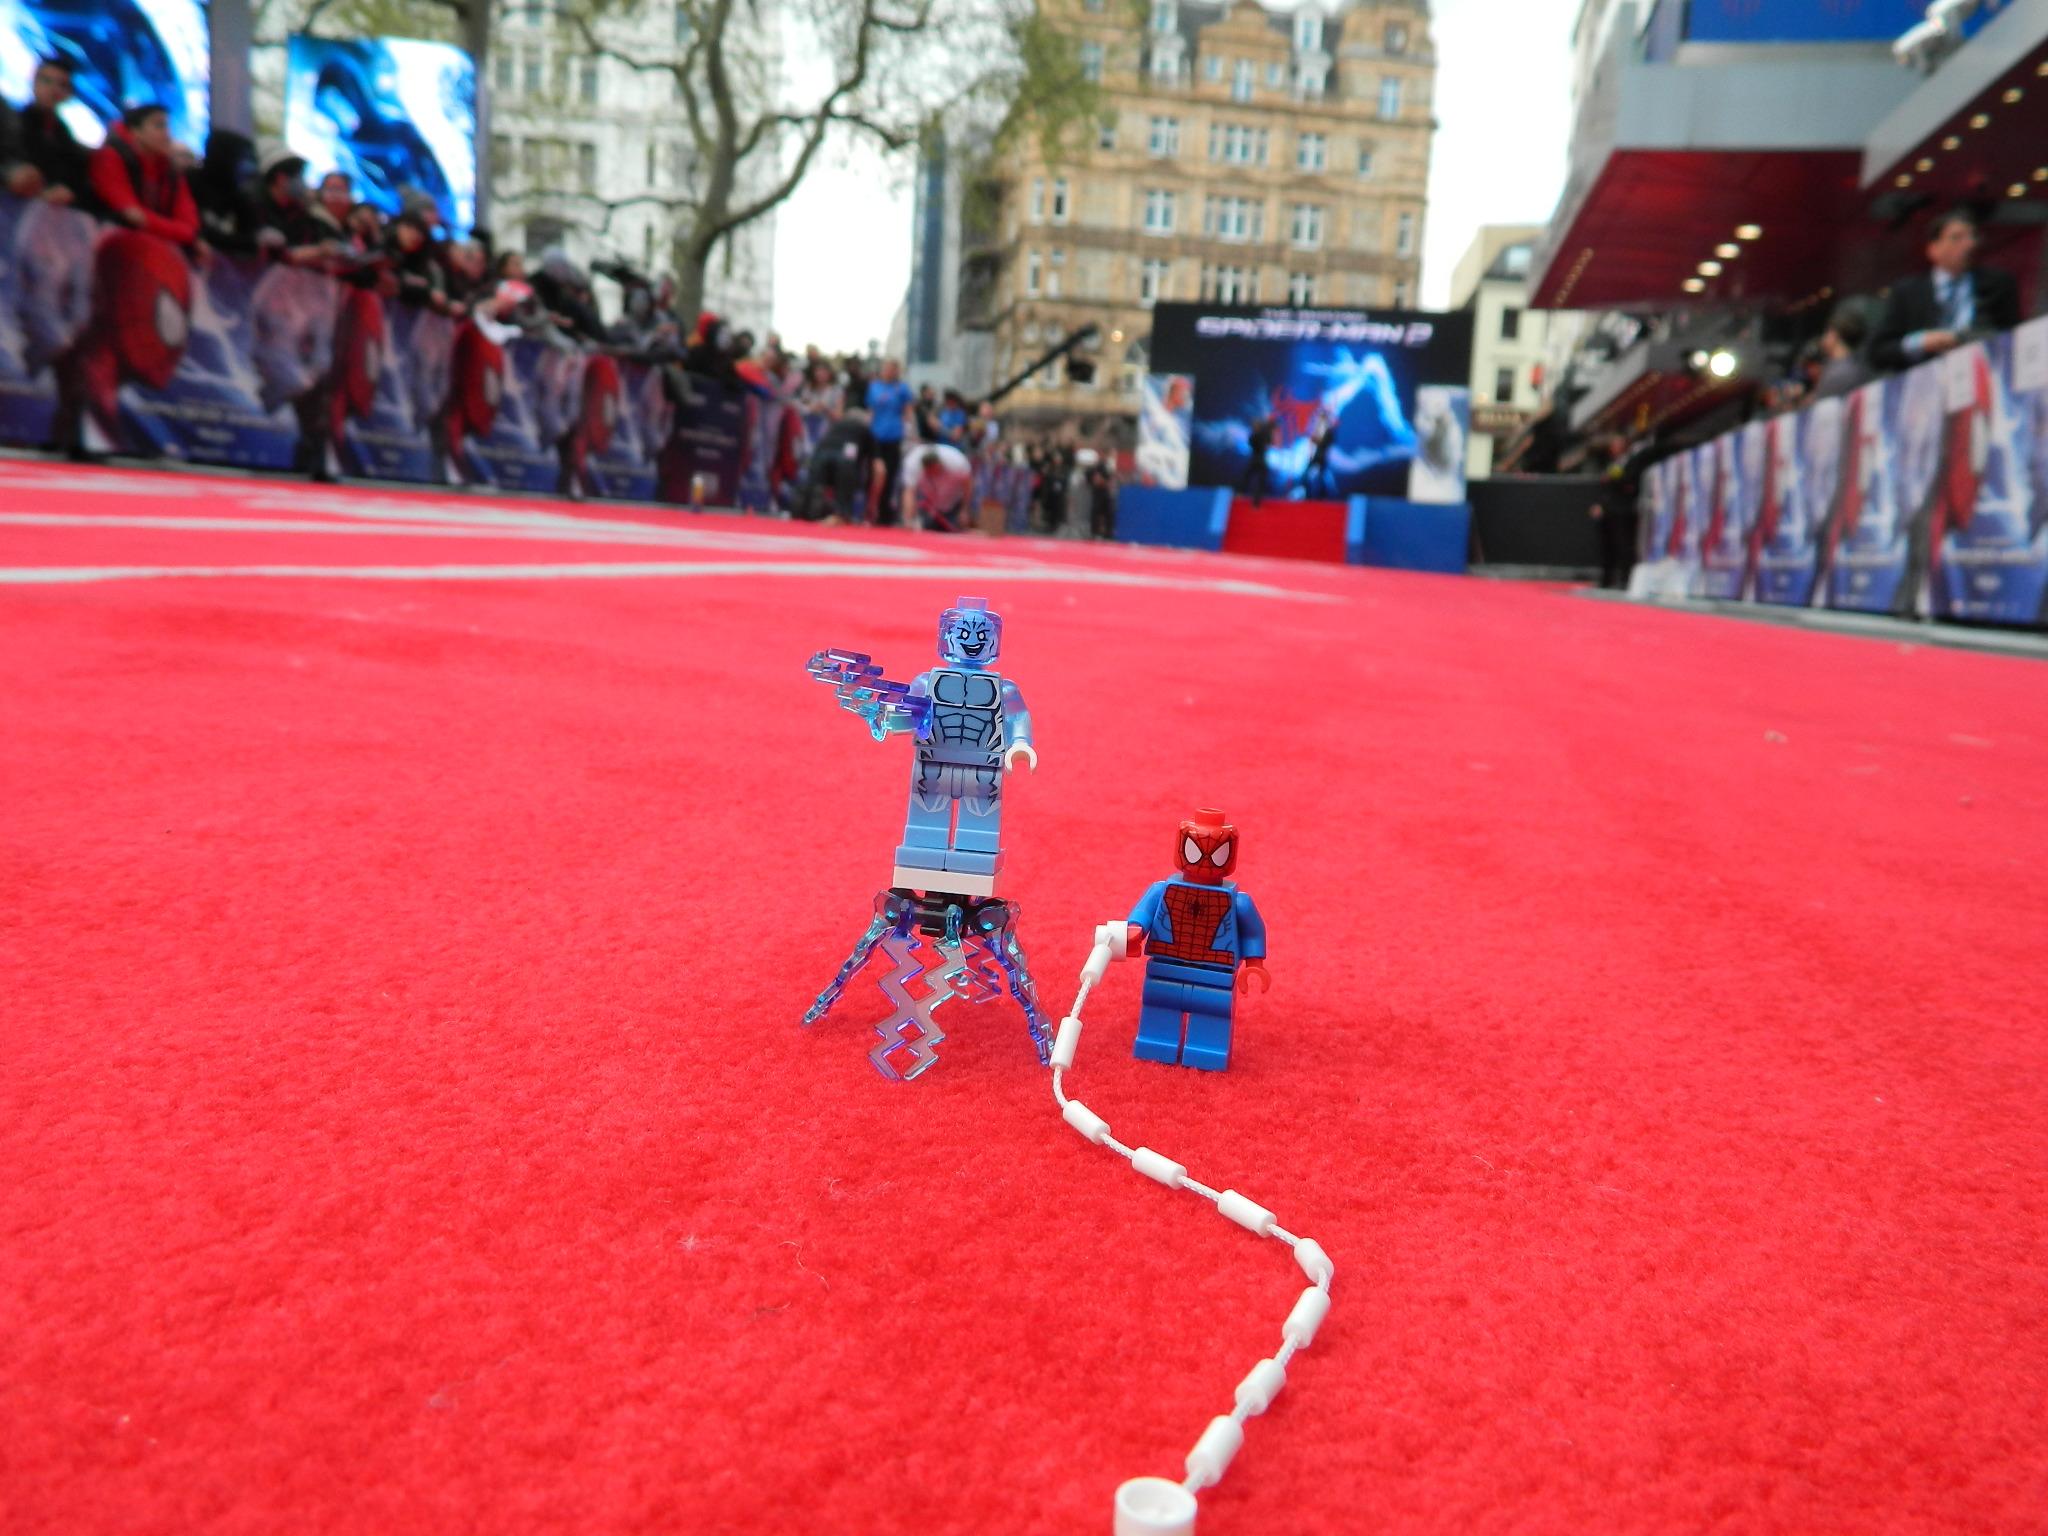 Lego ultimate spider man electro - photo#22